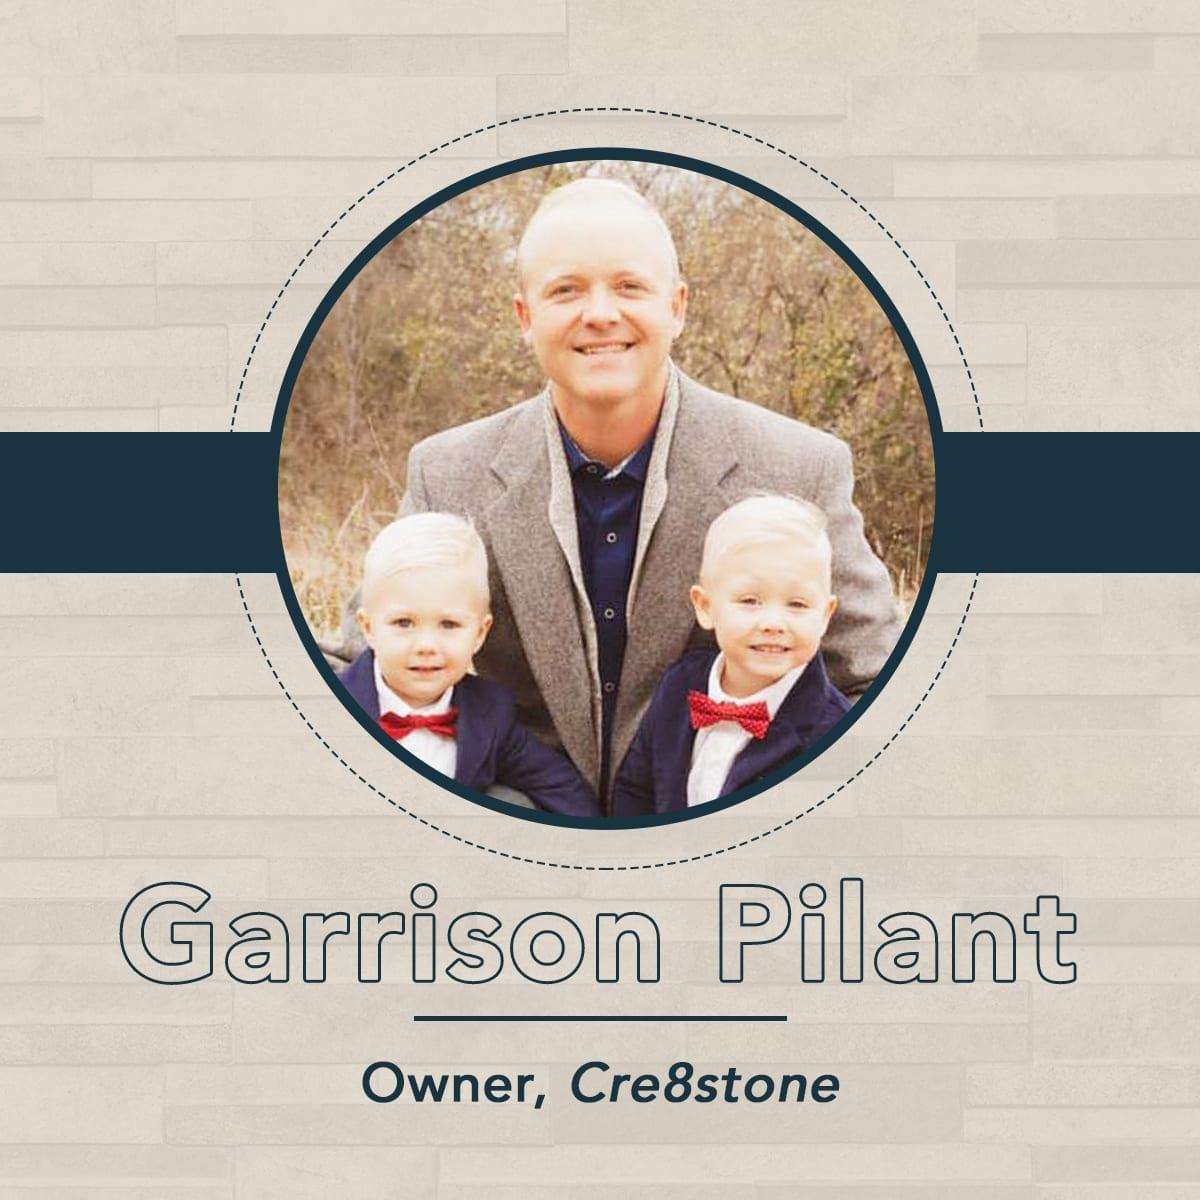 Garrison-Pilant